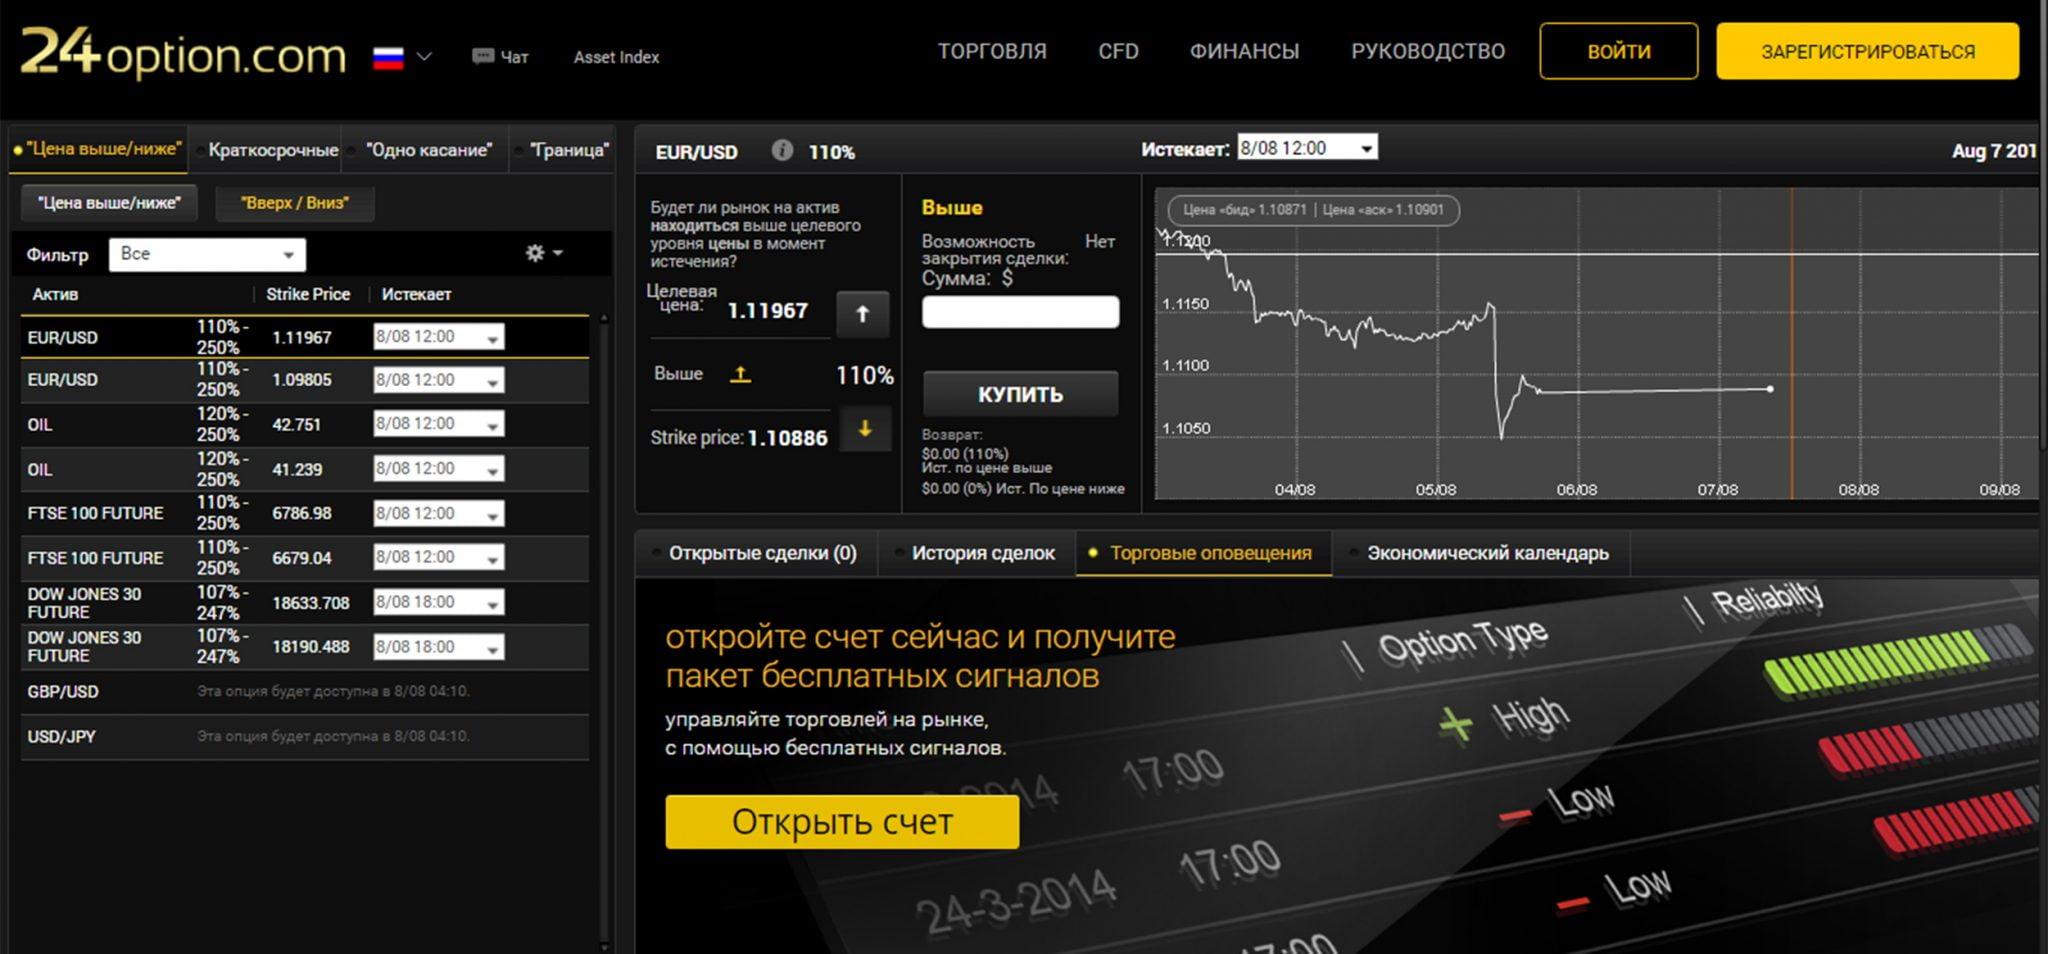 Платформа TechFinancials у брокера 24option